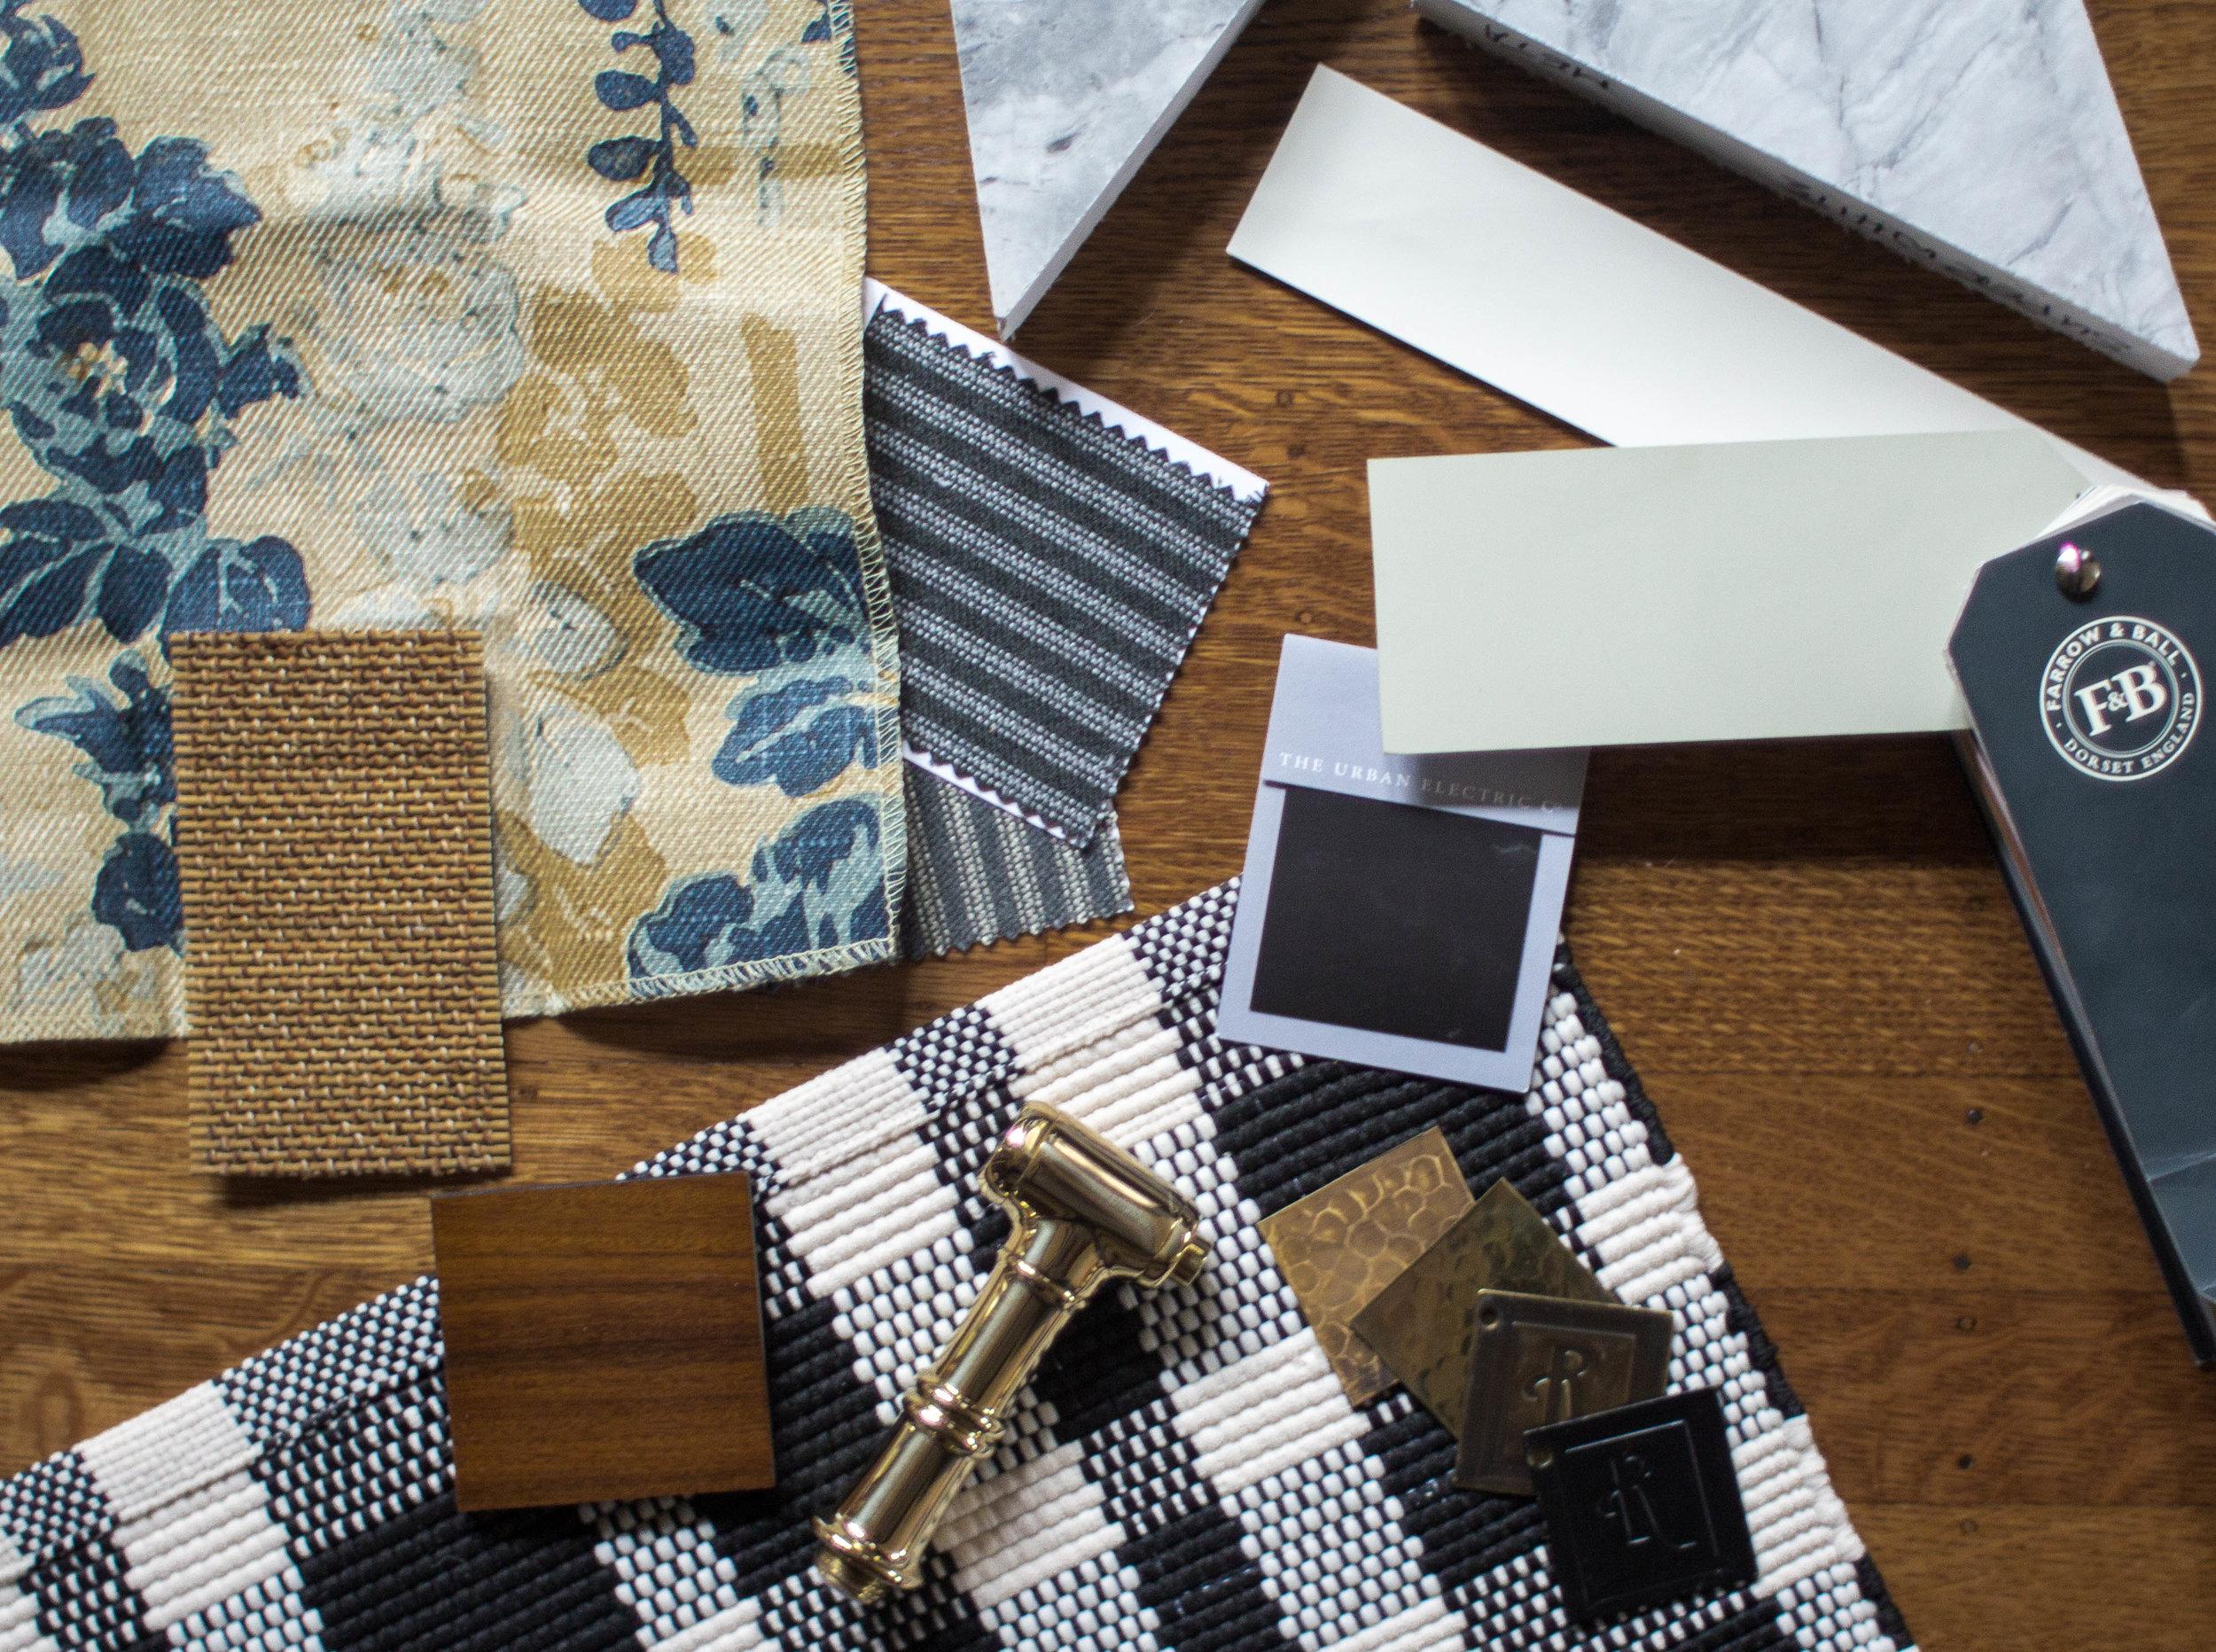 Kitchen Scheme - Textiles + Finishes